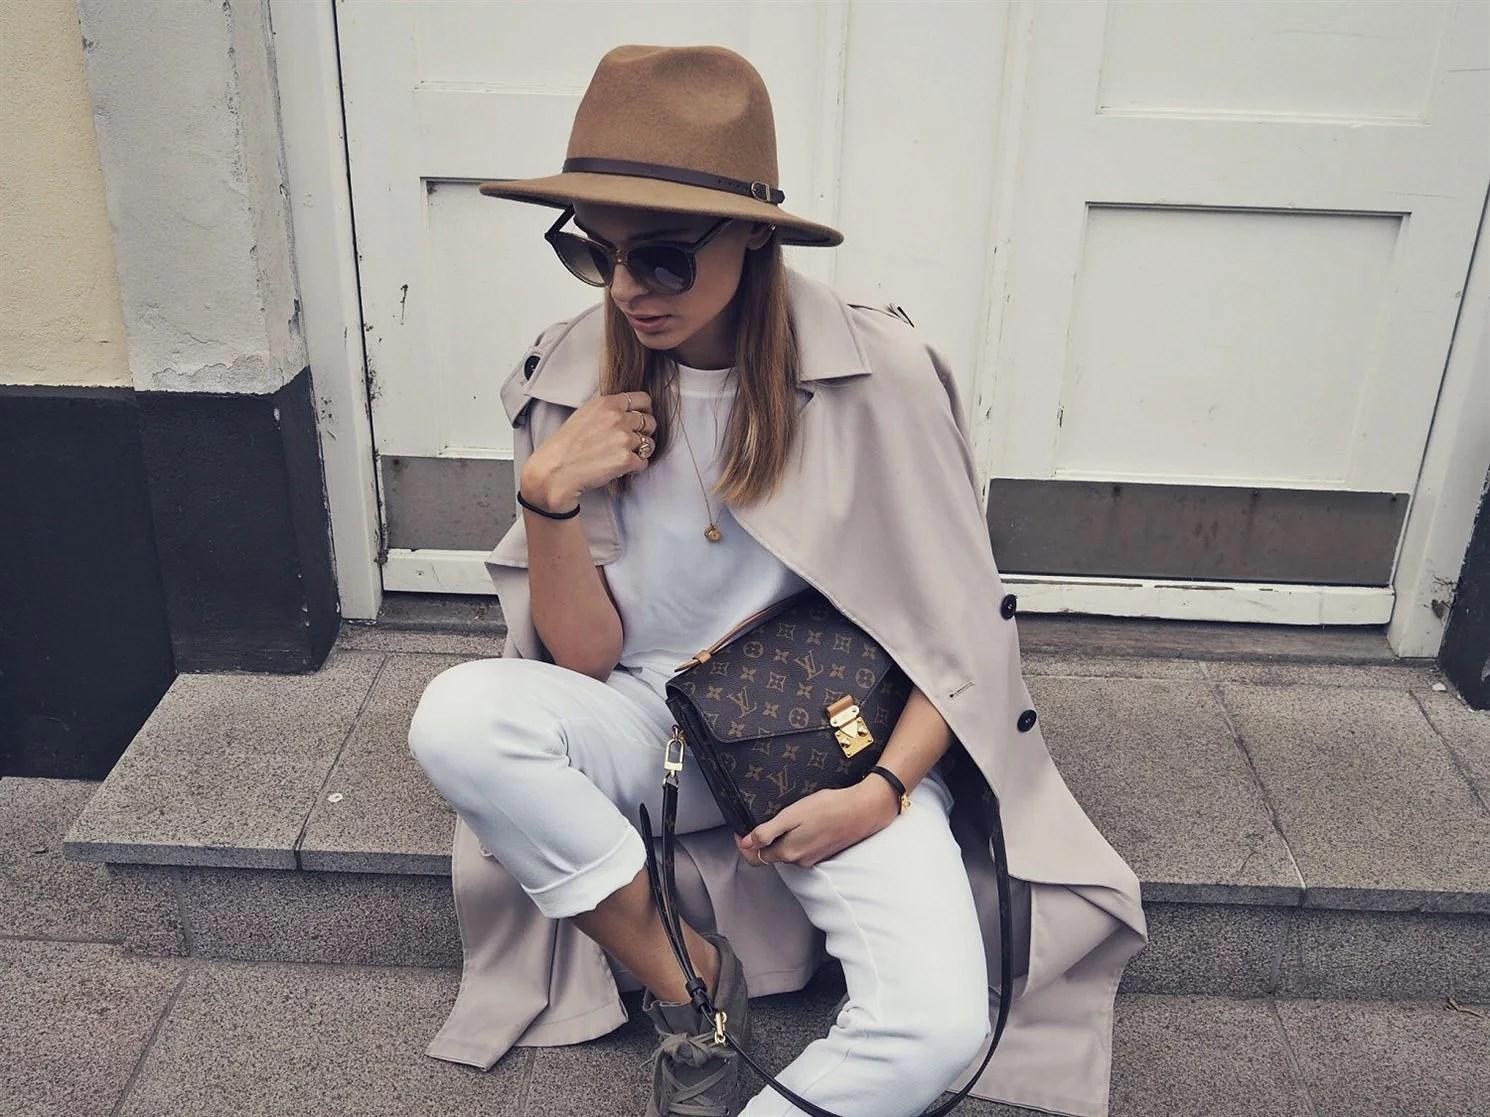 WHITE LOOK & FEDORA HAT